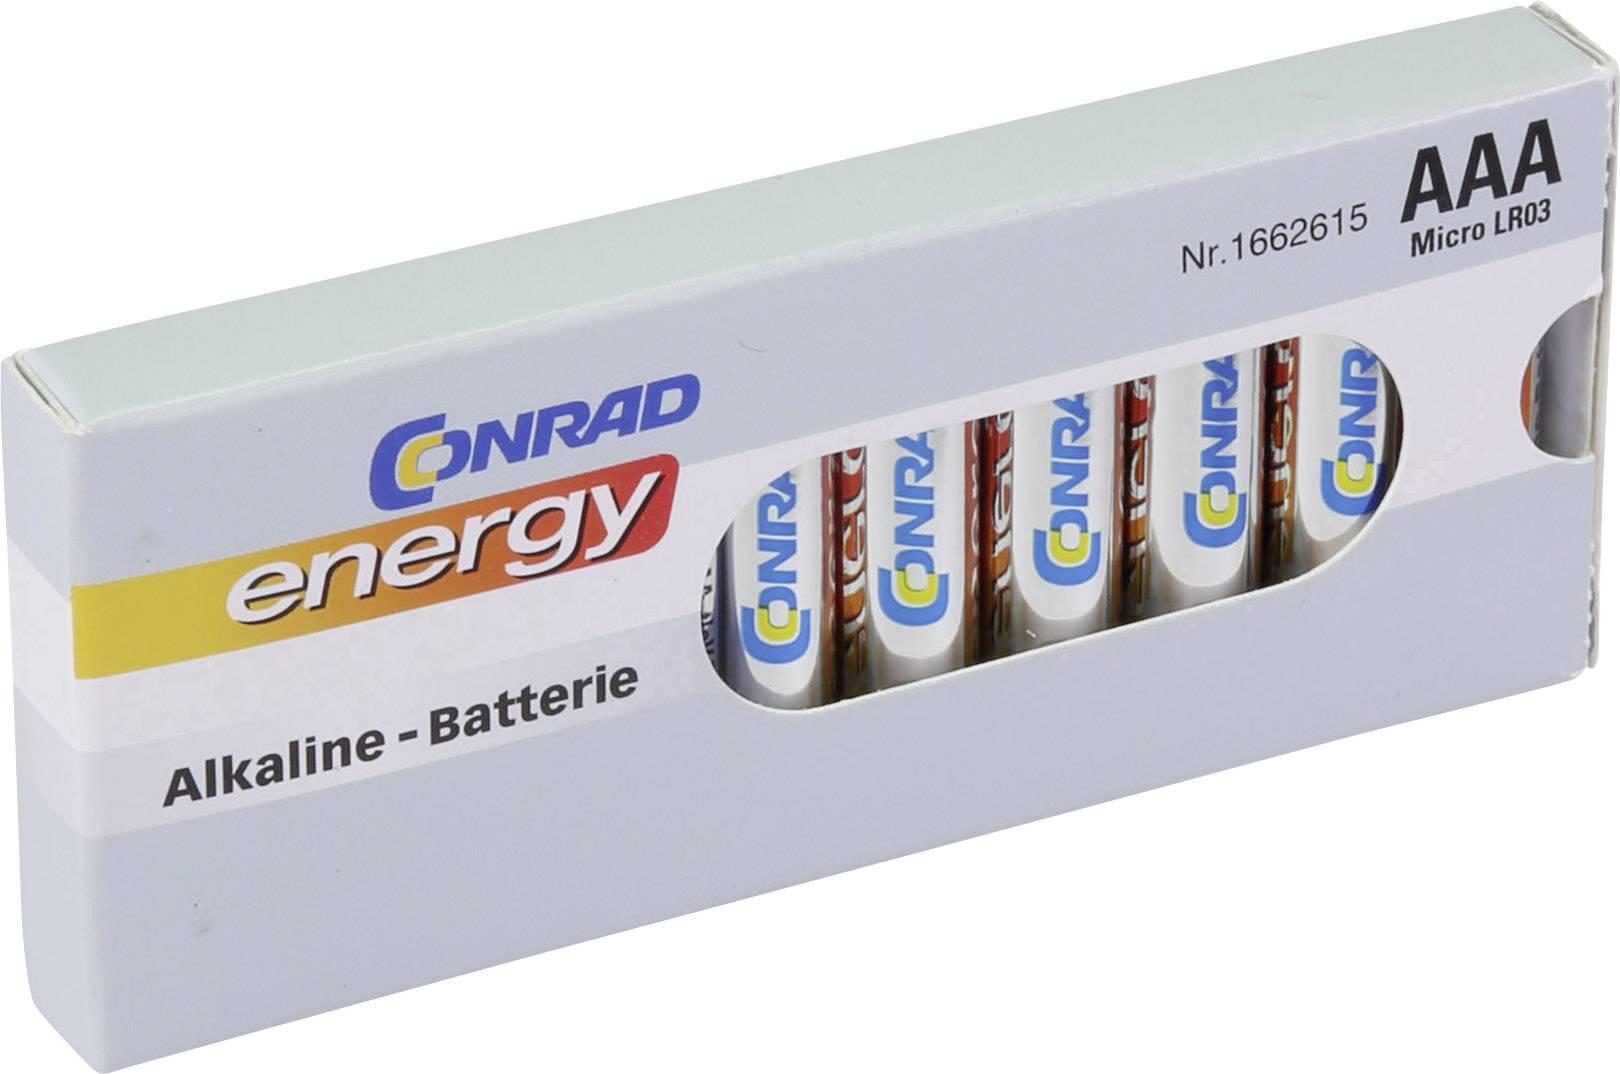 Mikrotužková batérie typu AAA alkalicko/mangánová Conrad energy LR03, 1.5 V, 10 ks